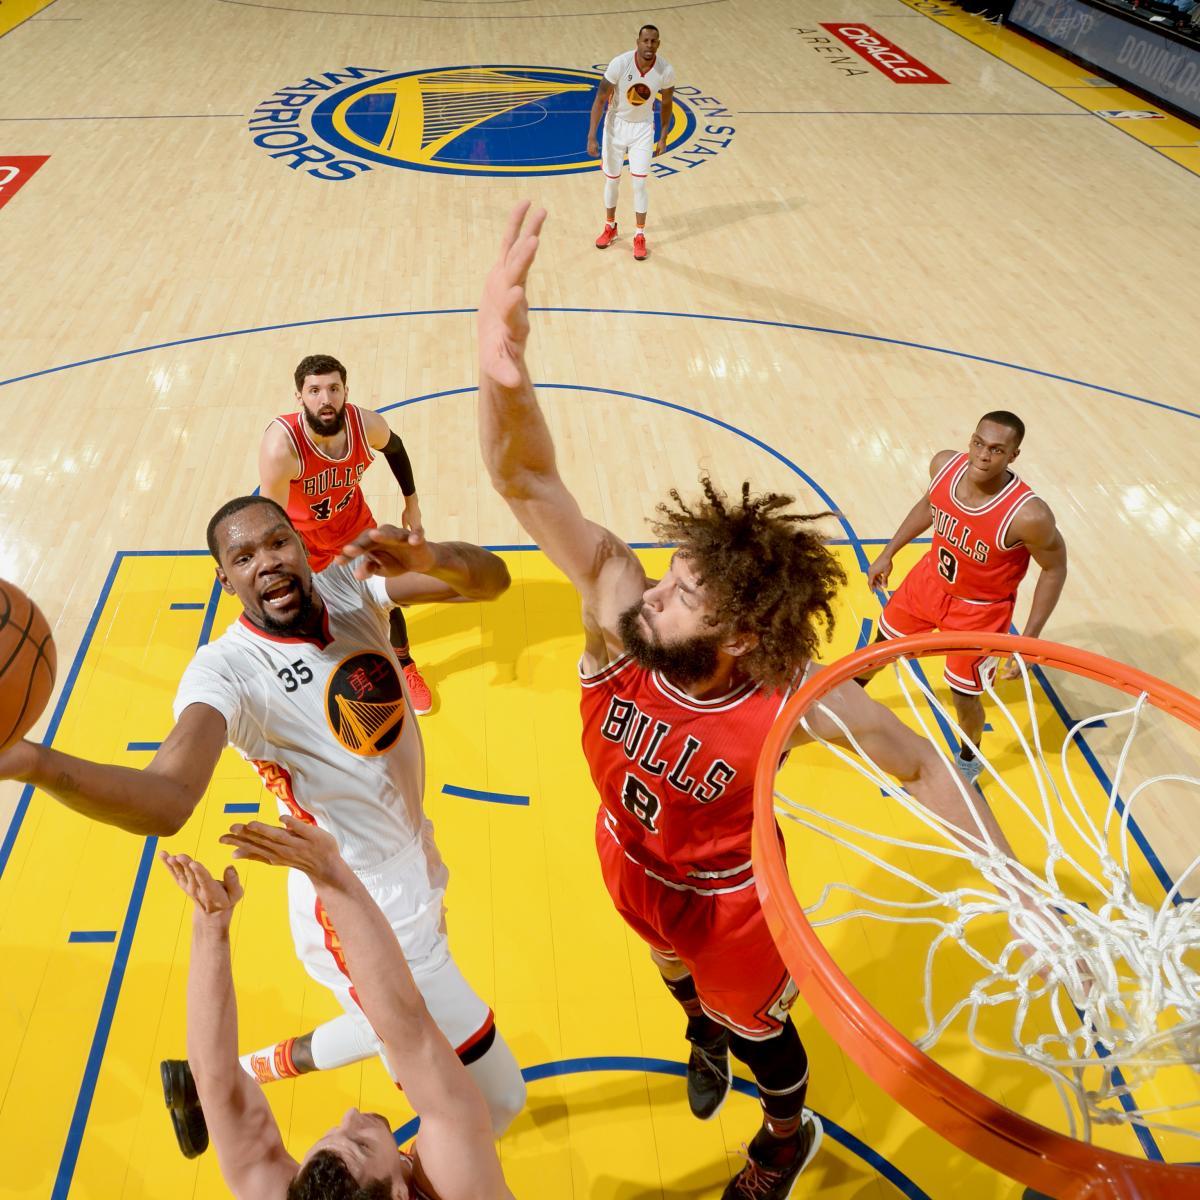 Golden State Warriors Vs Wizards Full Game Highlights: Bulls Vs Warriors Score Highlights Reaction From 2017